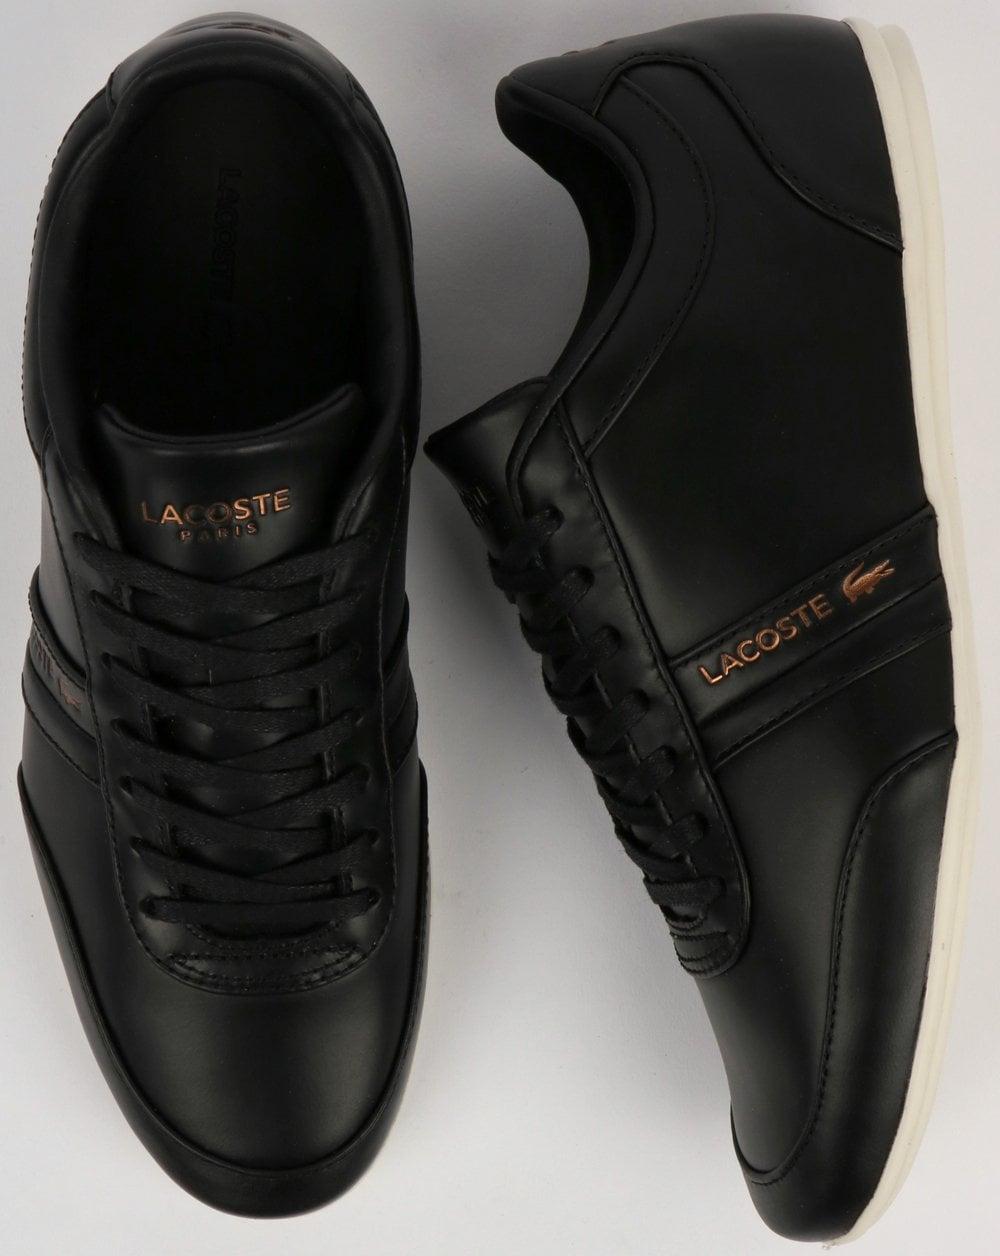 15258f91fd211 Lacoste Storda Trainer Black Off White